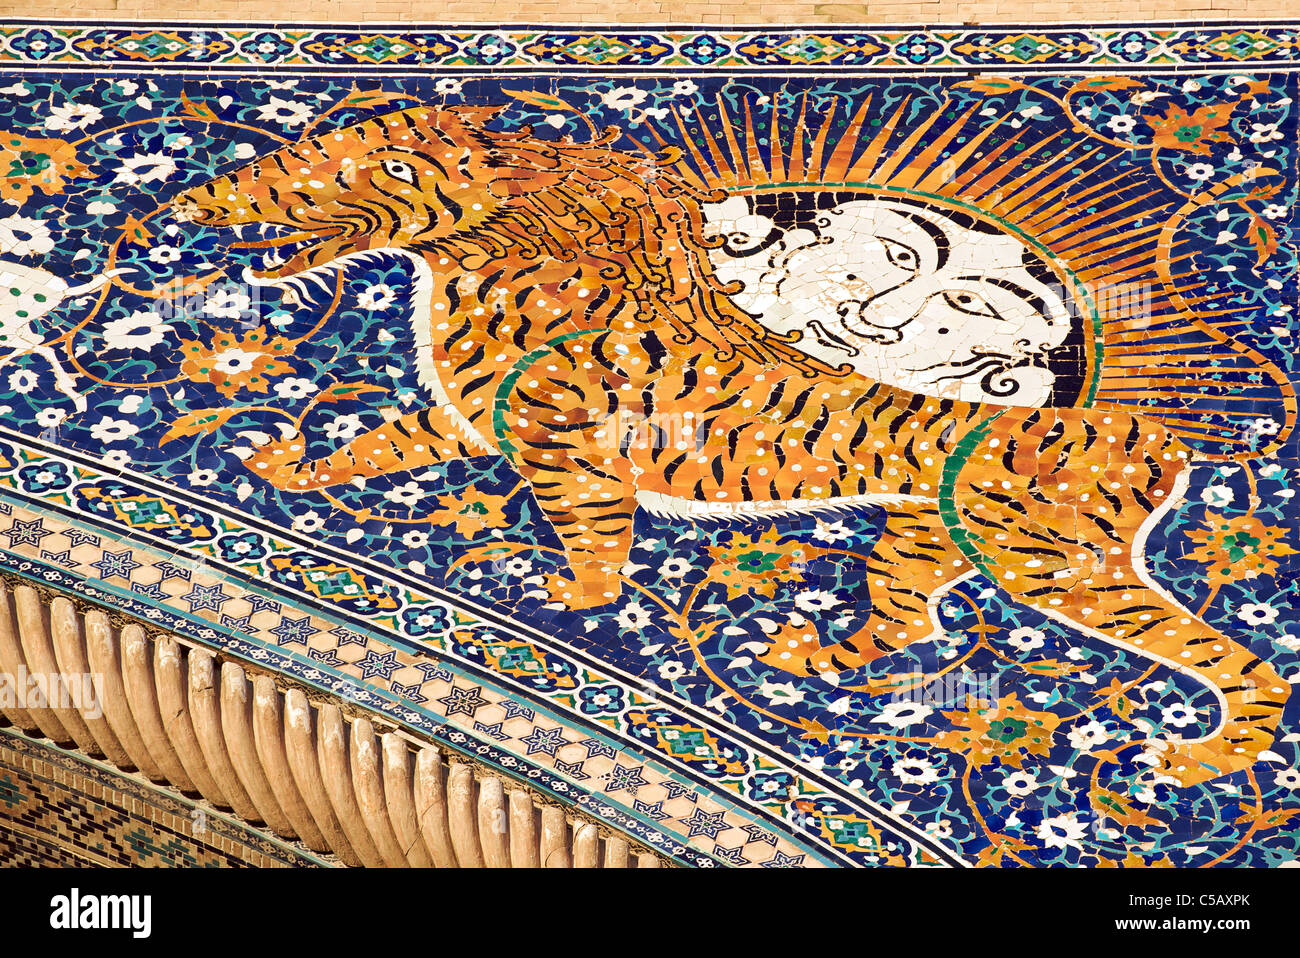 Animal iconography on Sher Dor Madrassah on Registan Square, Samarkand, Uzbekistan - Stock Image